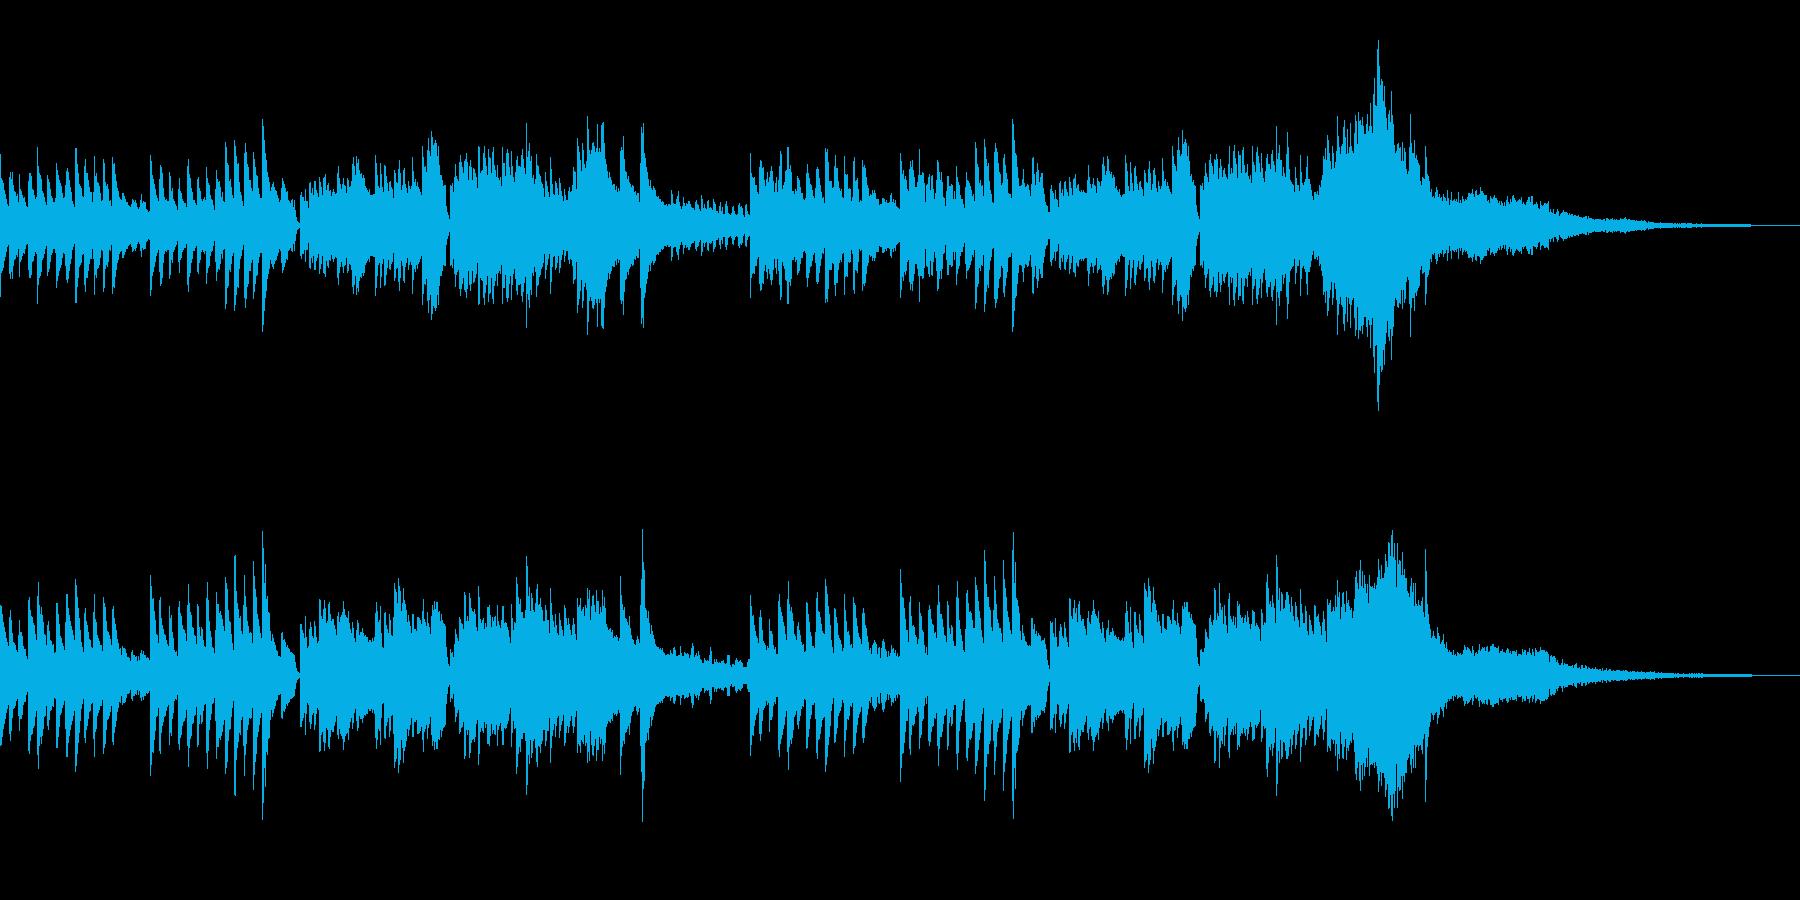 CM 和風 ピアノとフルート 映像などにの再生済みの波形